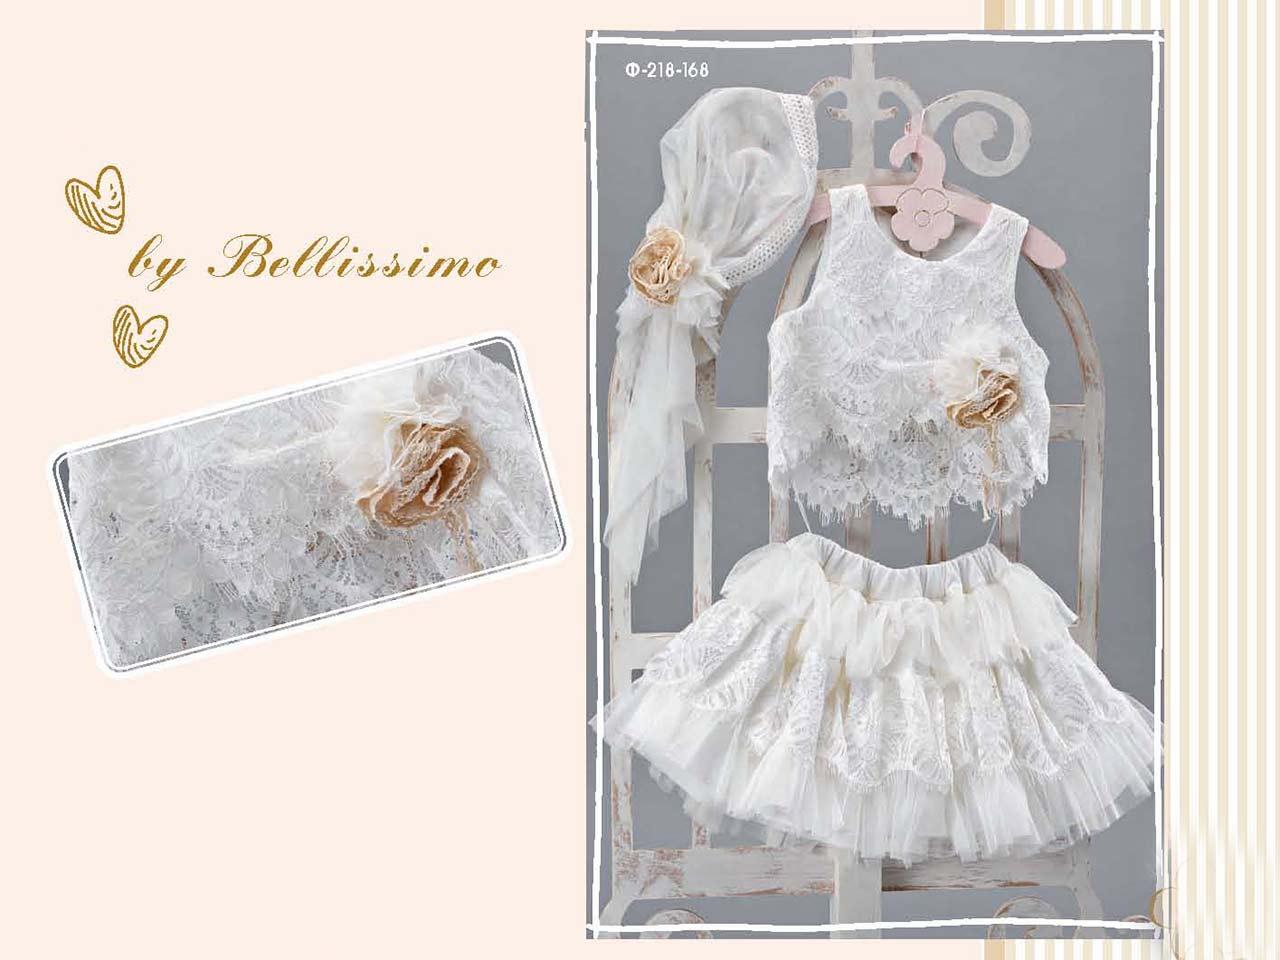 8649f7f7102 Βαπτιστικό Σετ Δαντέλας Μπλούζα και Φούστα - Βαπτιστικό Φόρεμα